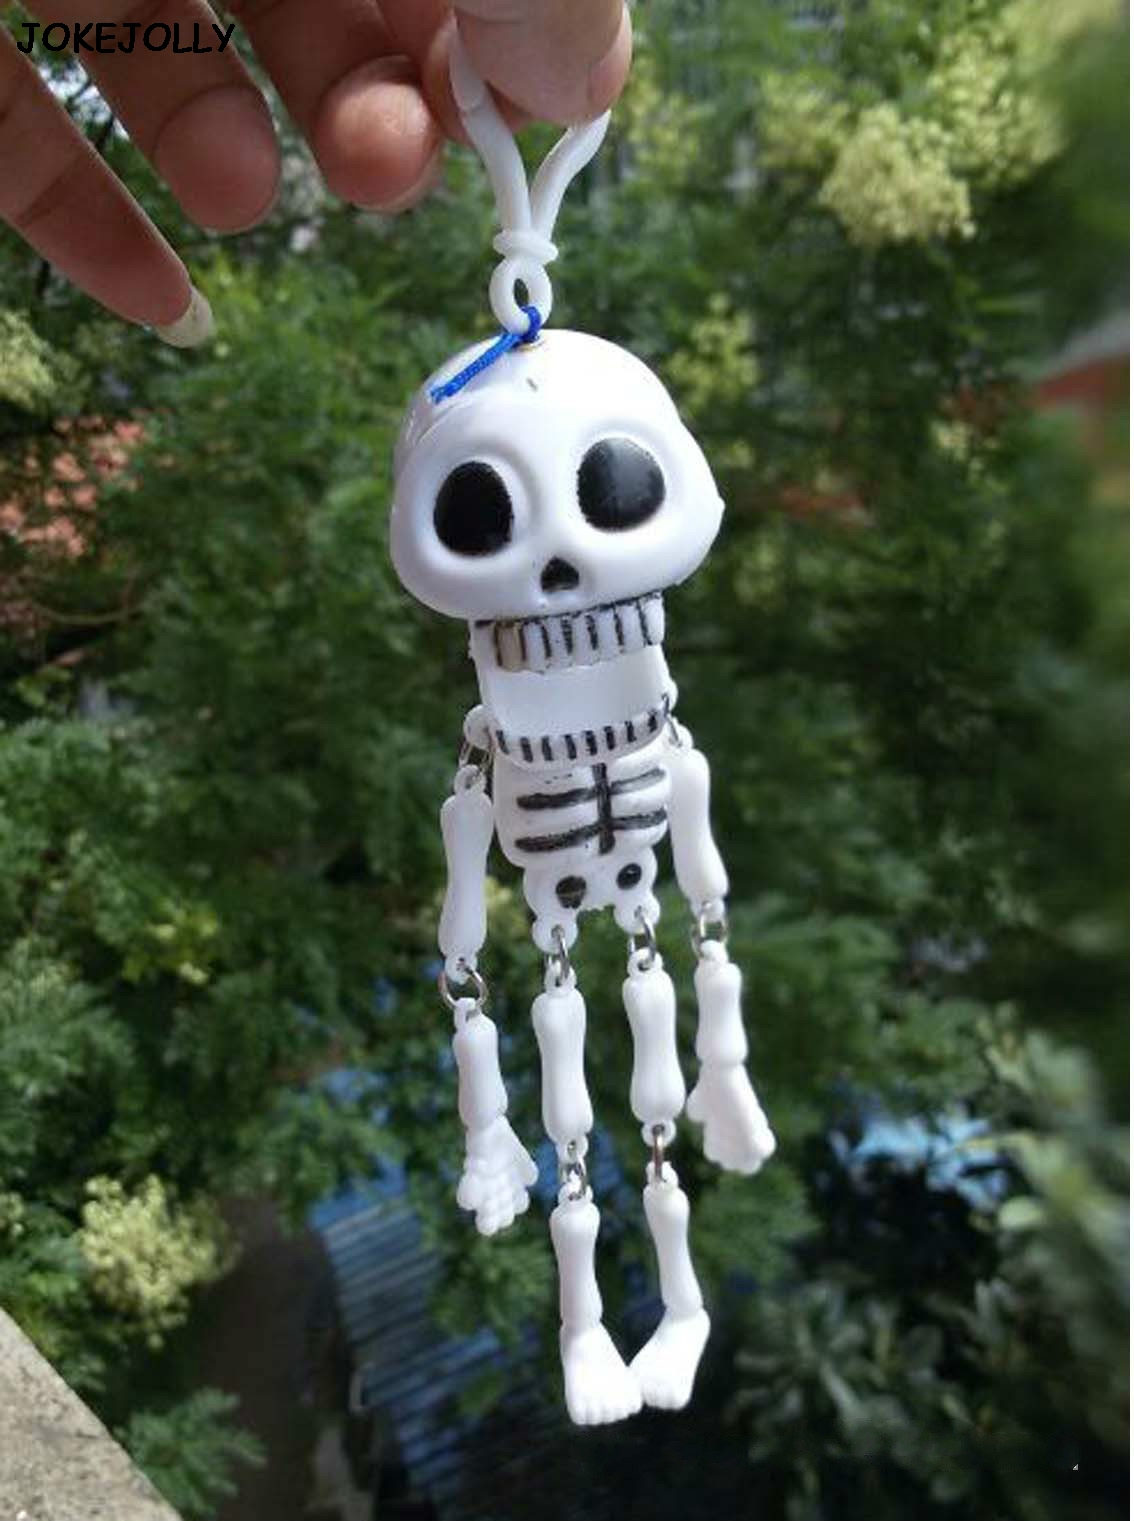 Halloween Toy Kids Adult Funny 15cm Plastic Luminous Skull Skeleton Body 2018 Scary Simulation Halloween Toy Festival Gags & Practical Jokes Novelty & Gag Toys